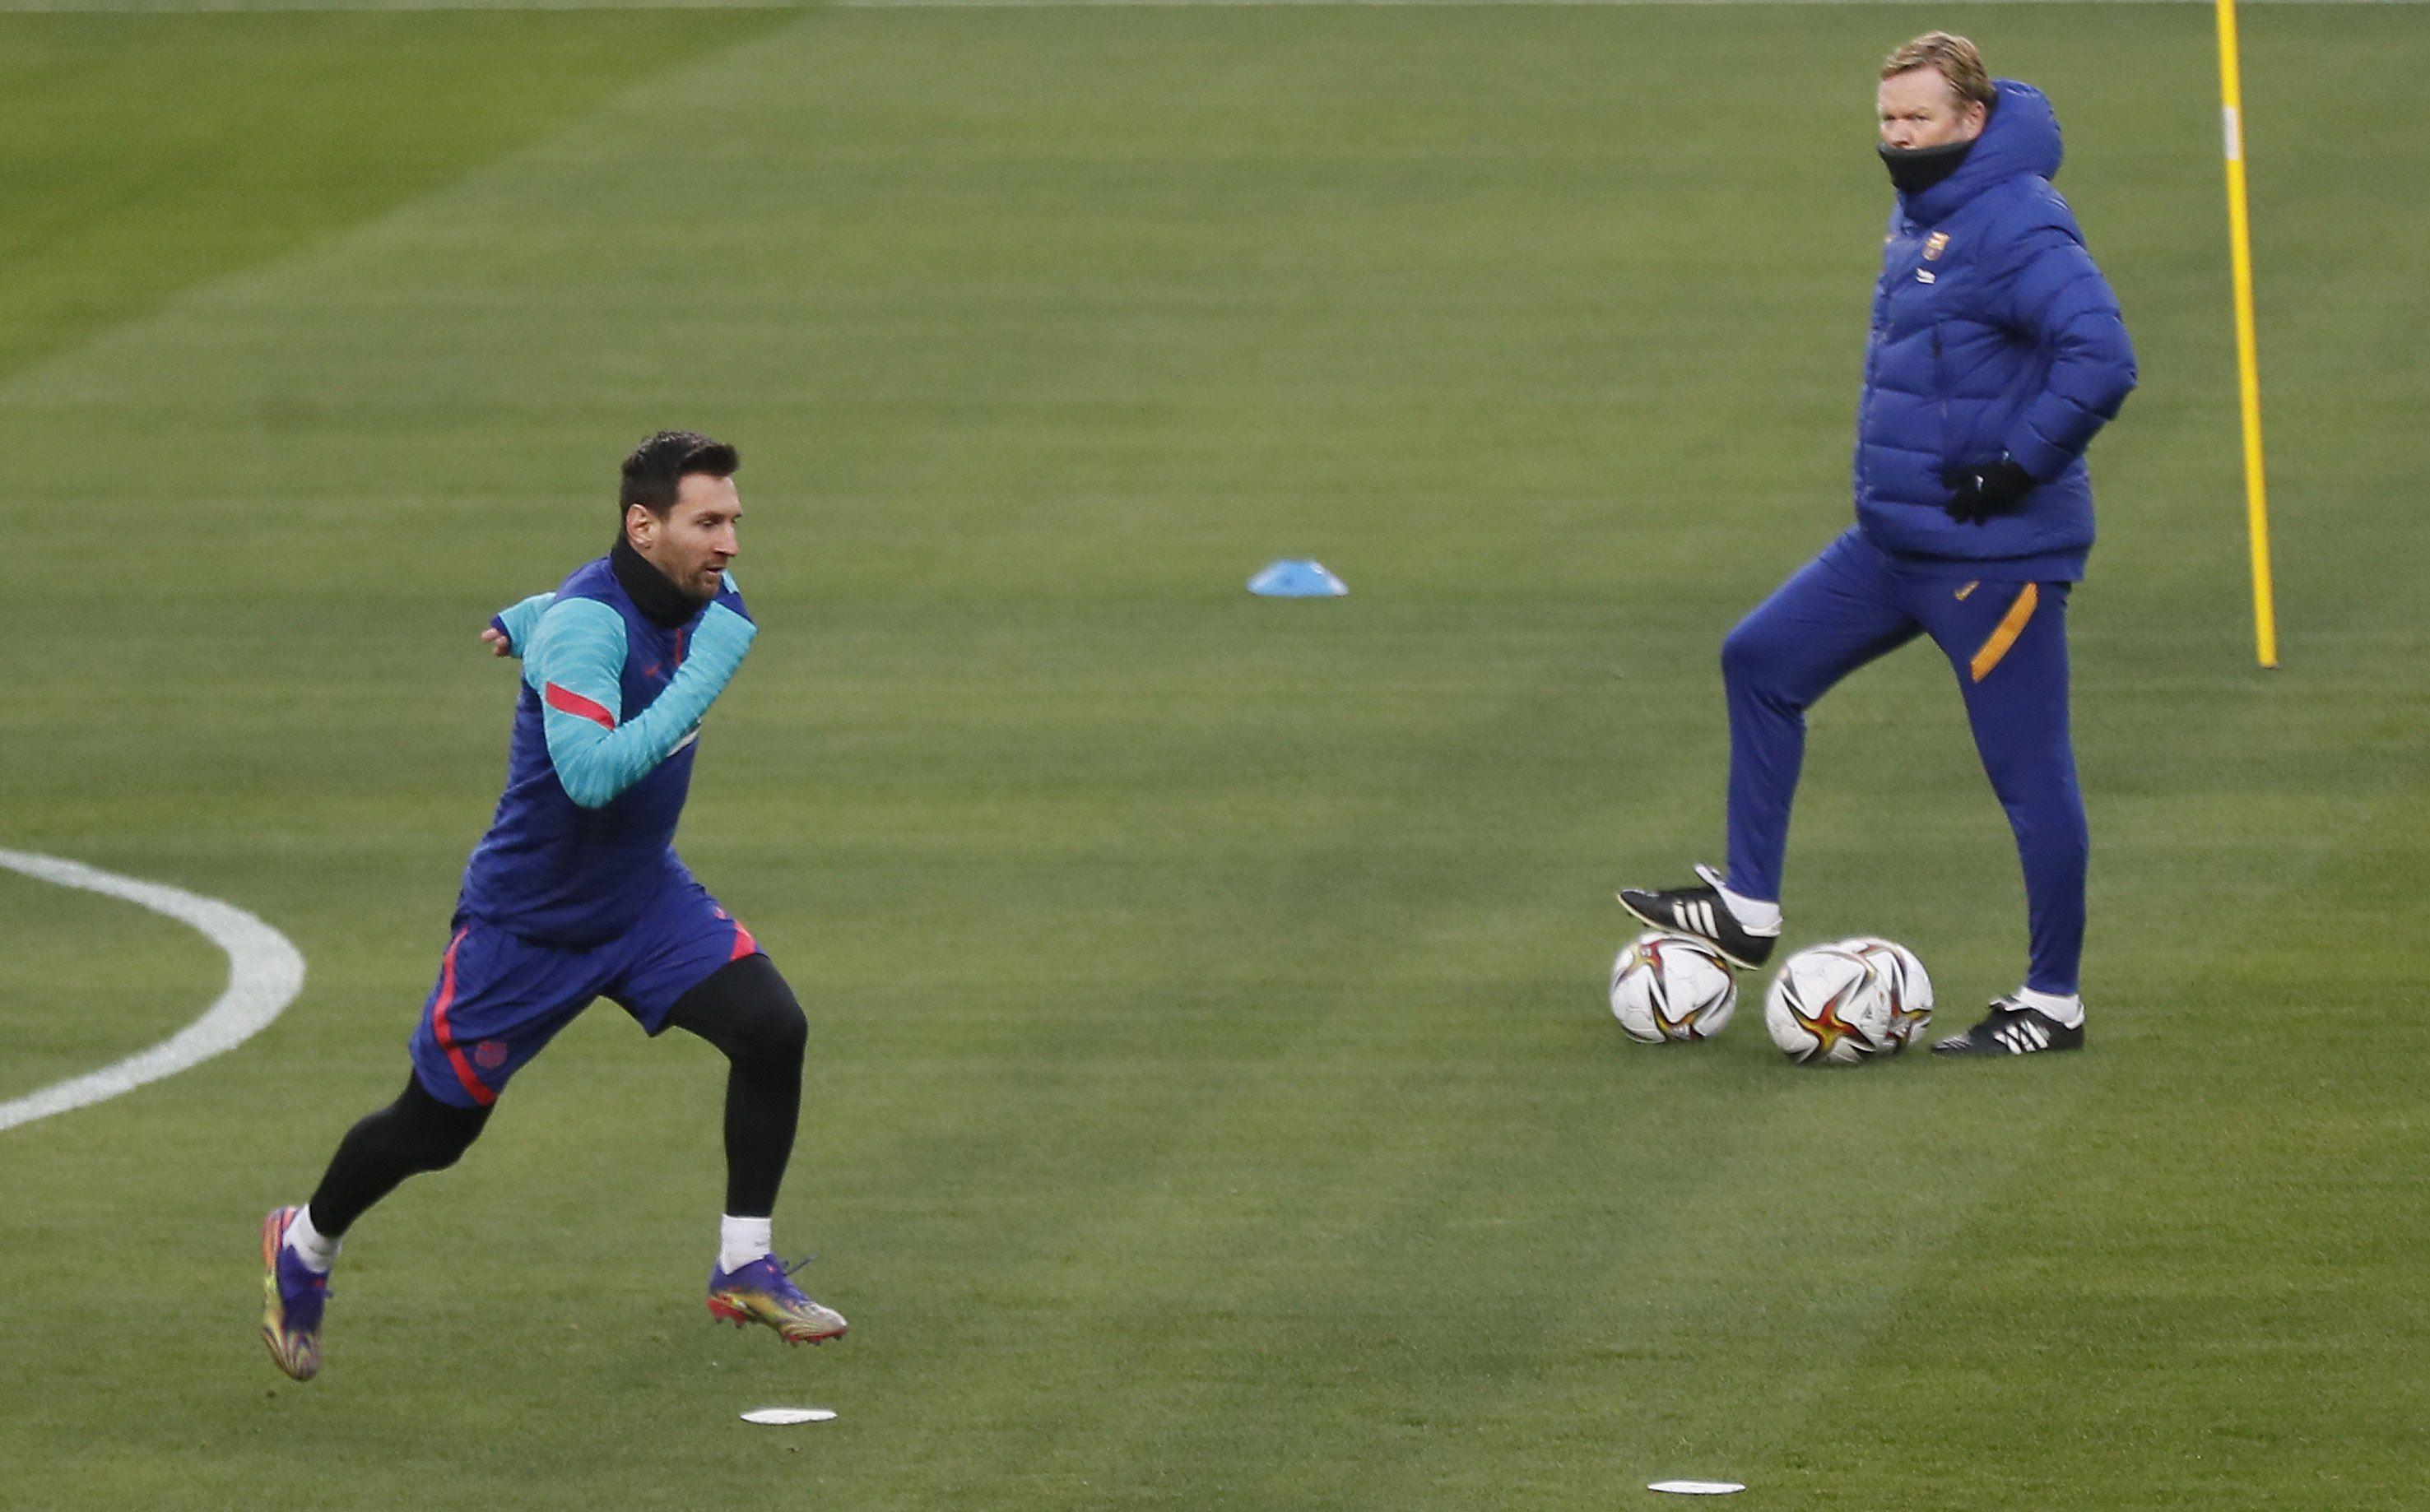 Koeman habló de la continuidad de Messi en el Barcelona (EFE/Jose Manuel Vidal)